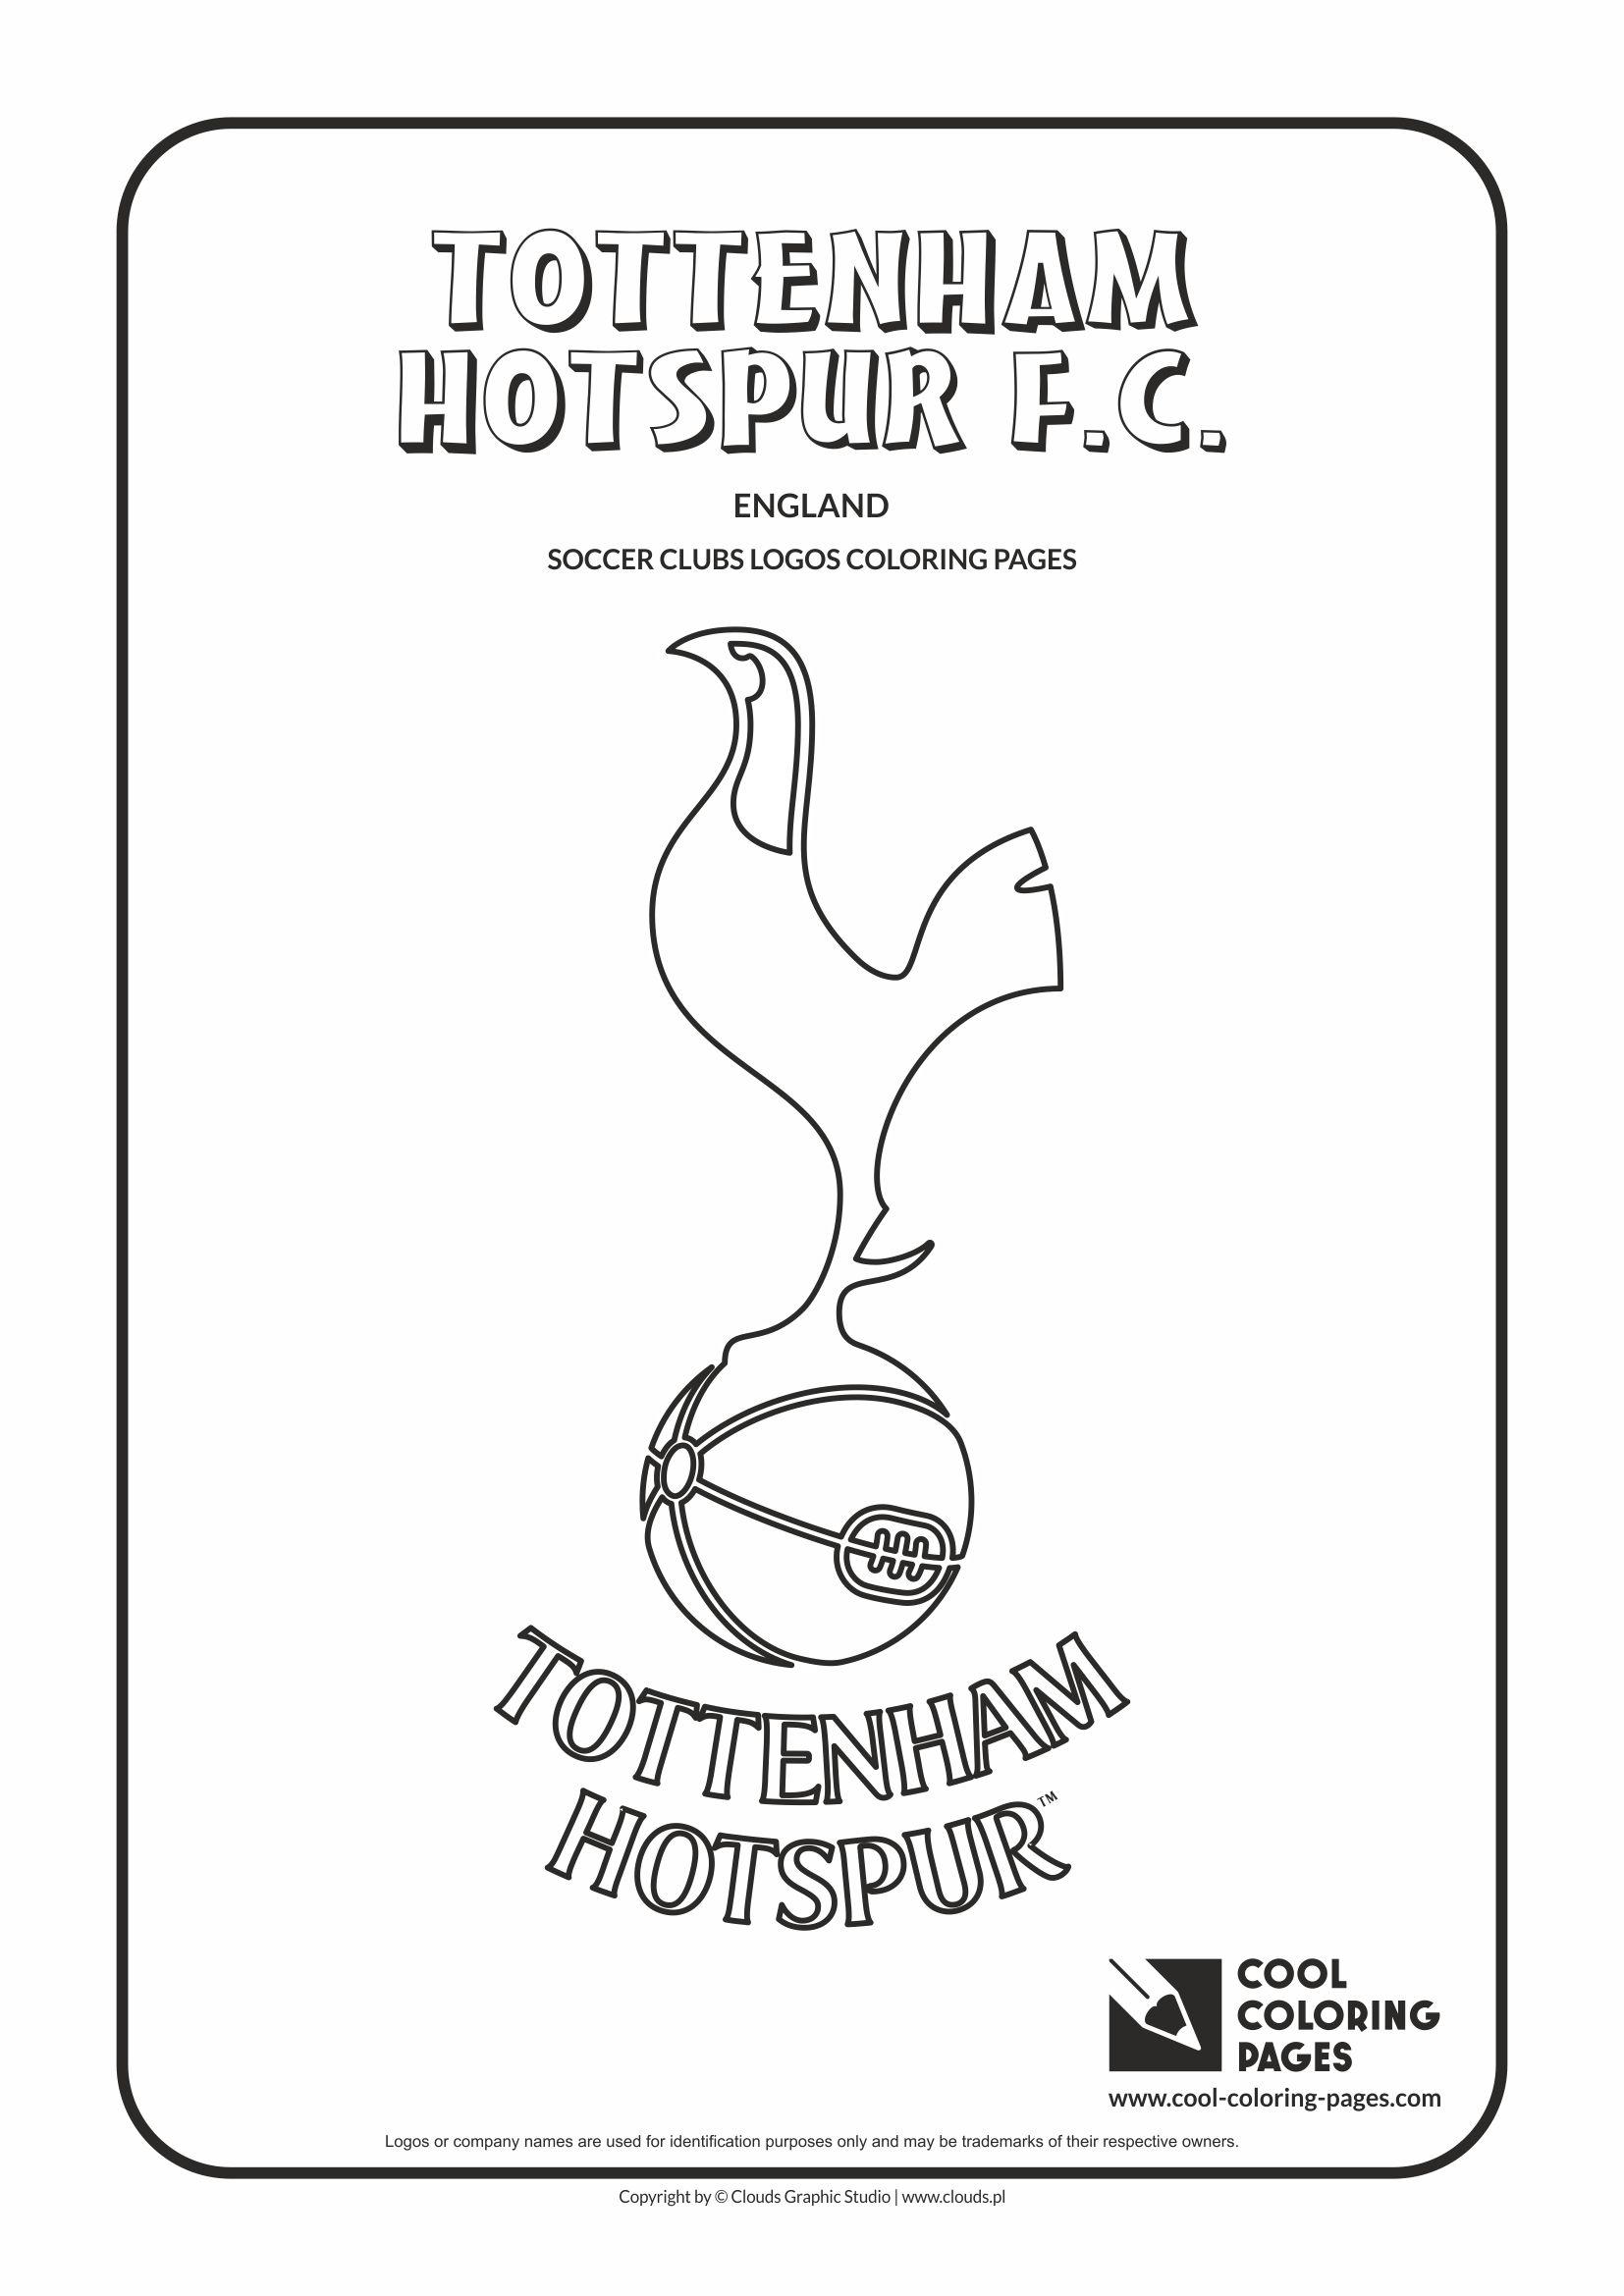 Cool Coloring Pages Tottenham Hotspur F.C. logo coloring